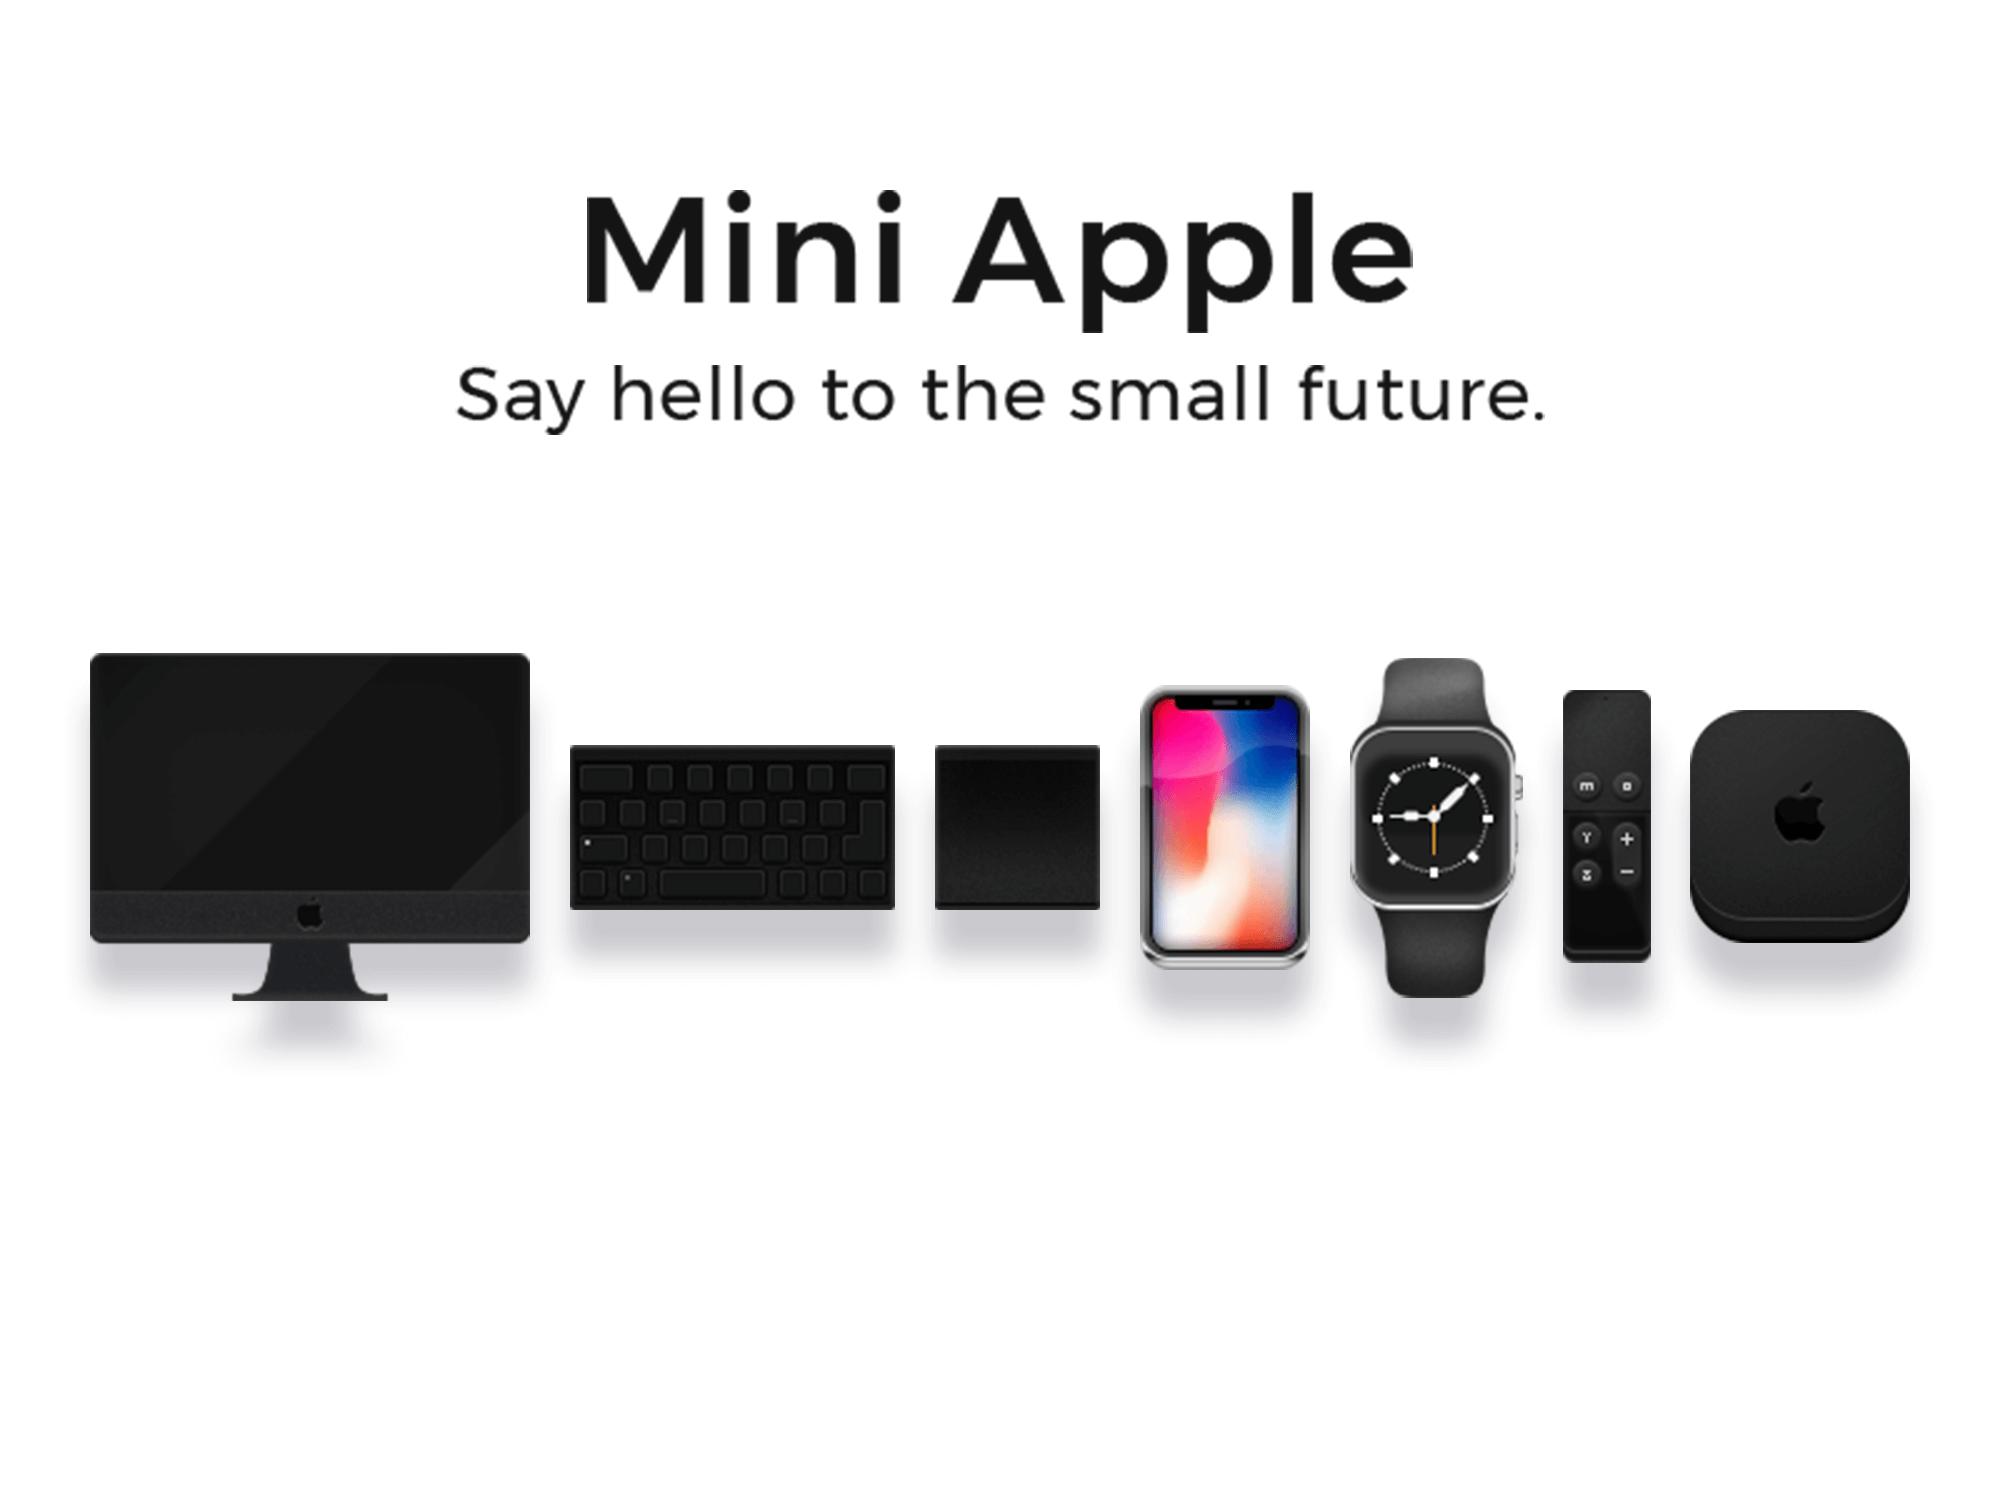 Mini Apple icons presentation image